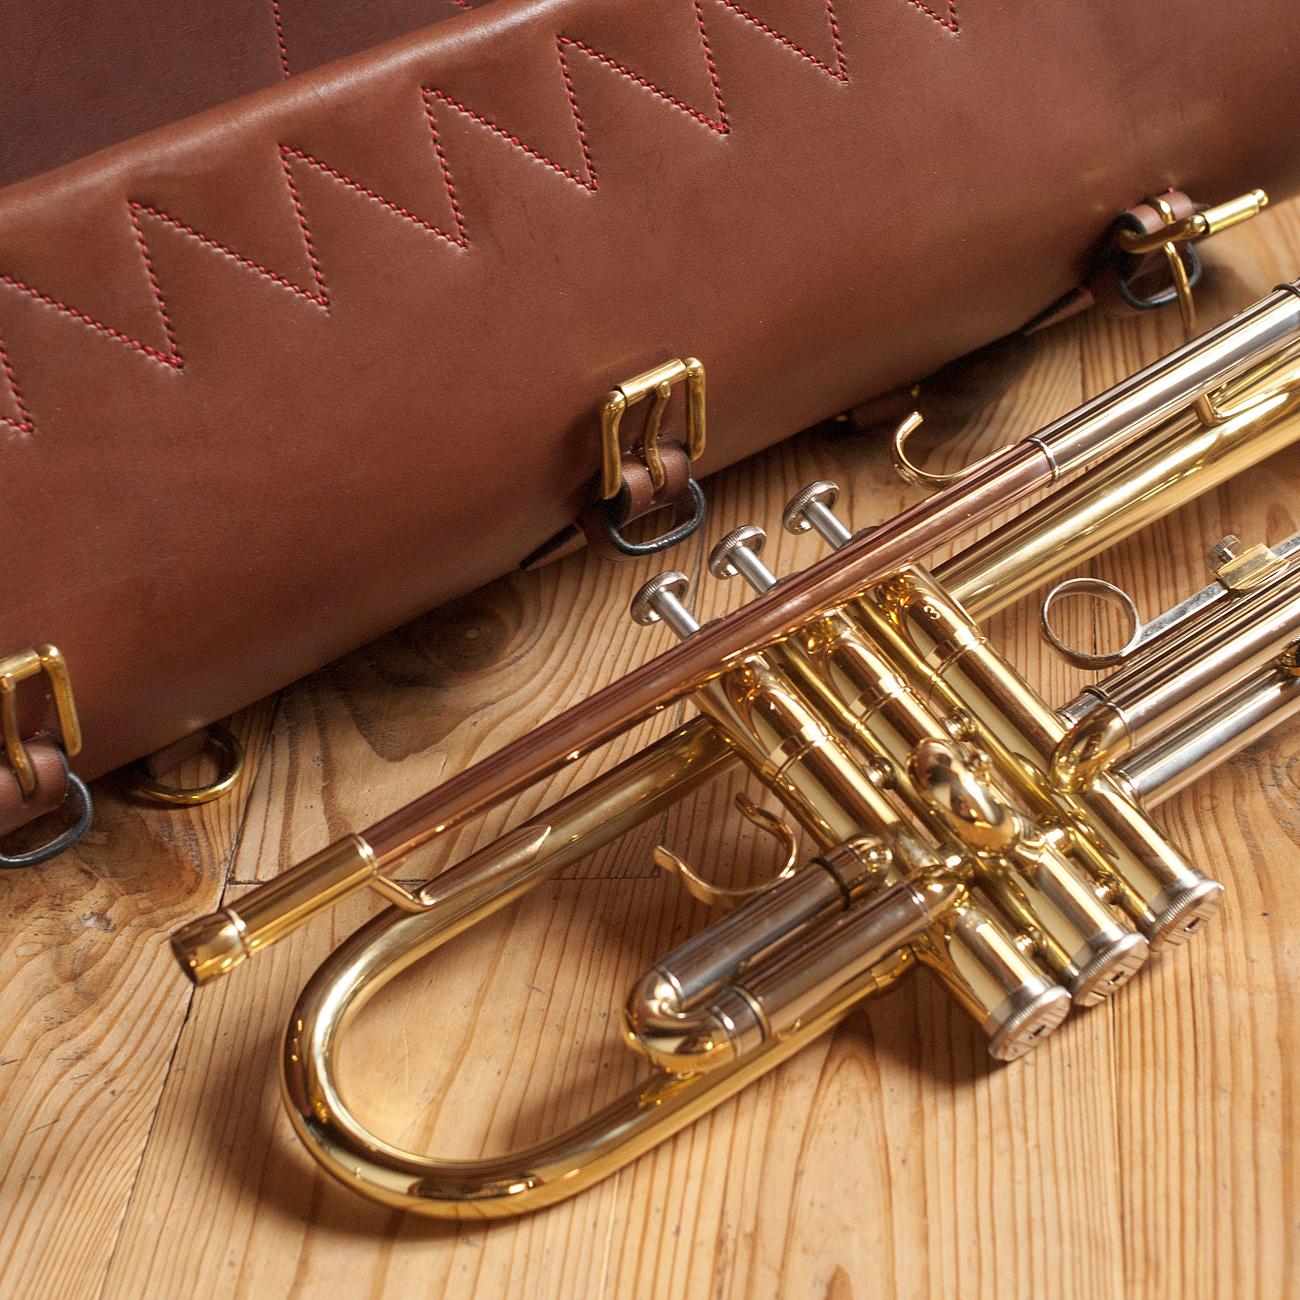 sacoche_trompette01_img03_HD